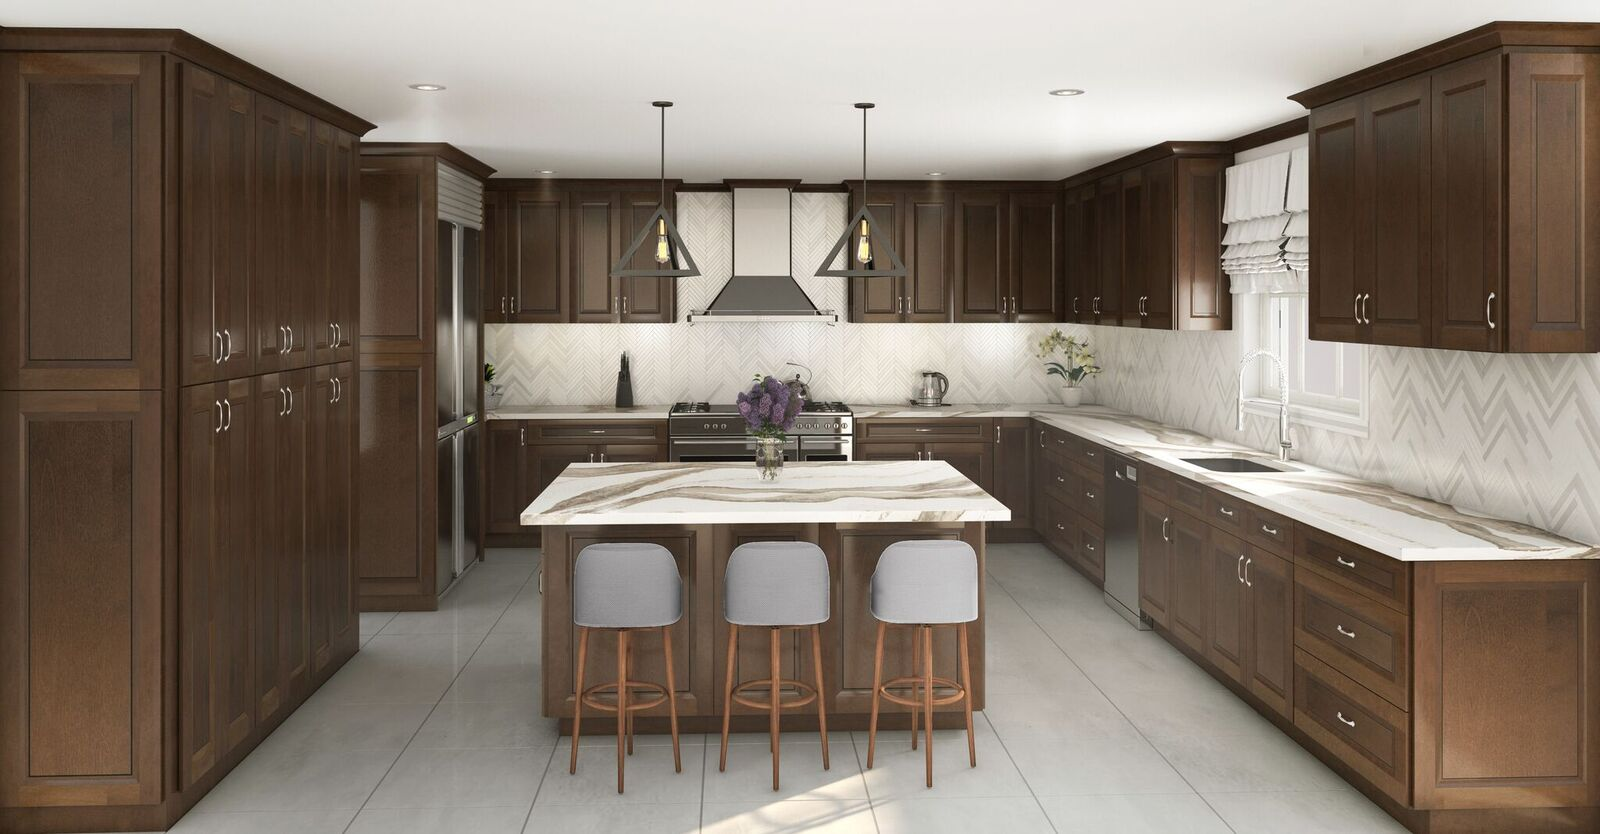 Kitchen Cabinets Bathroom Cabinets Quartz And More